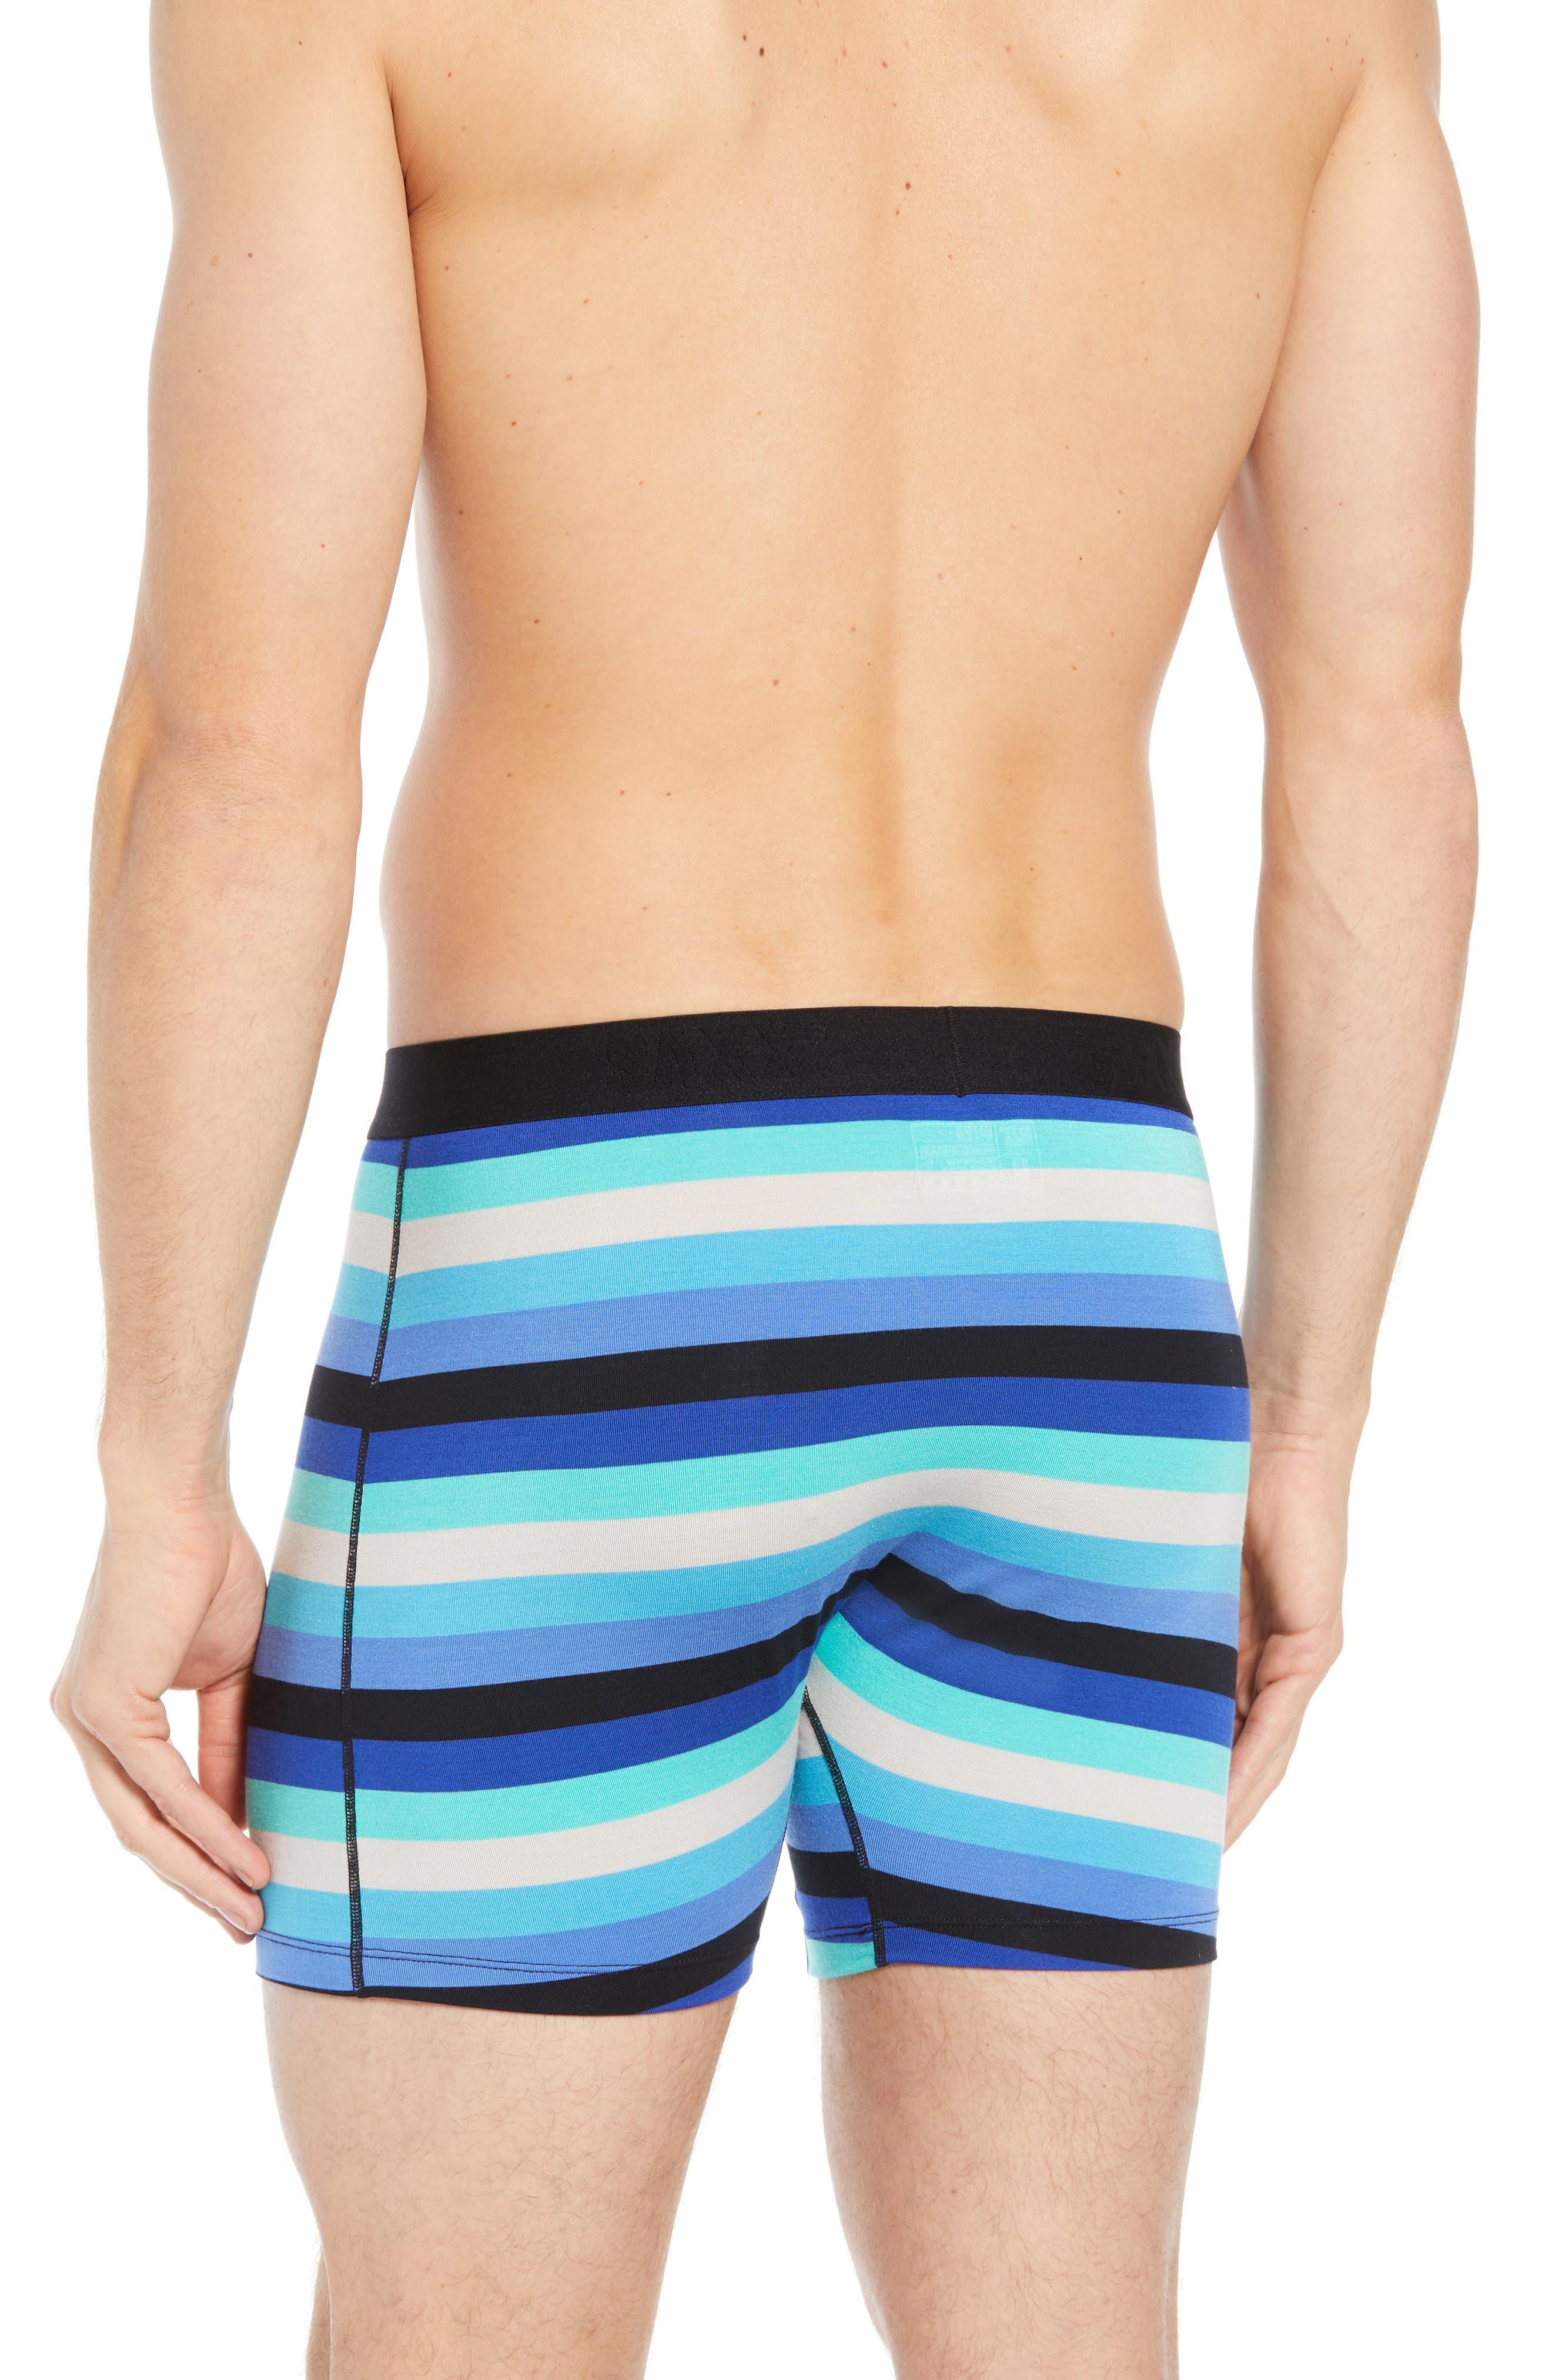 Ultra Cabana Stripe Stretch Boxer Briefs,                             Alternate thumbnail 2, color,                             BLUE CABANA STRIPE